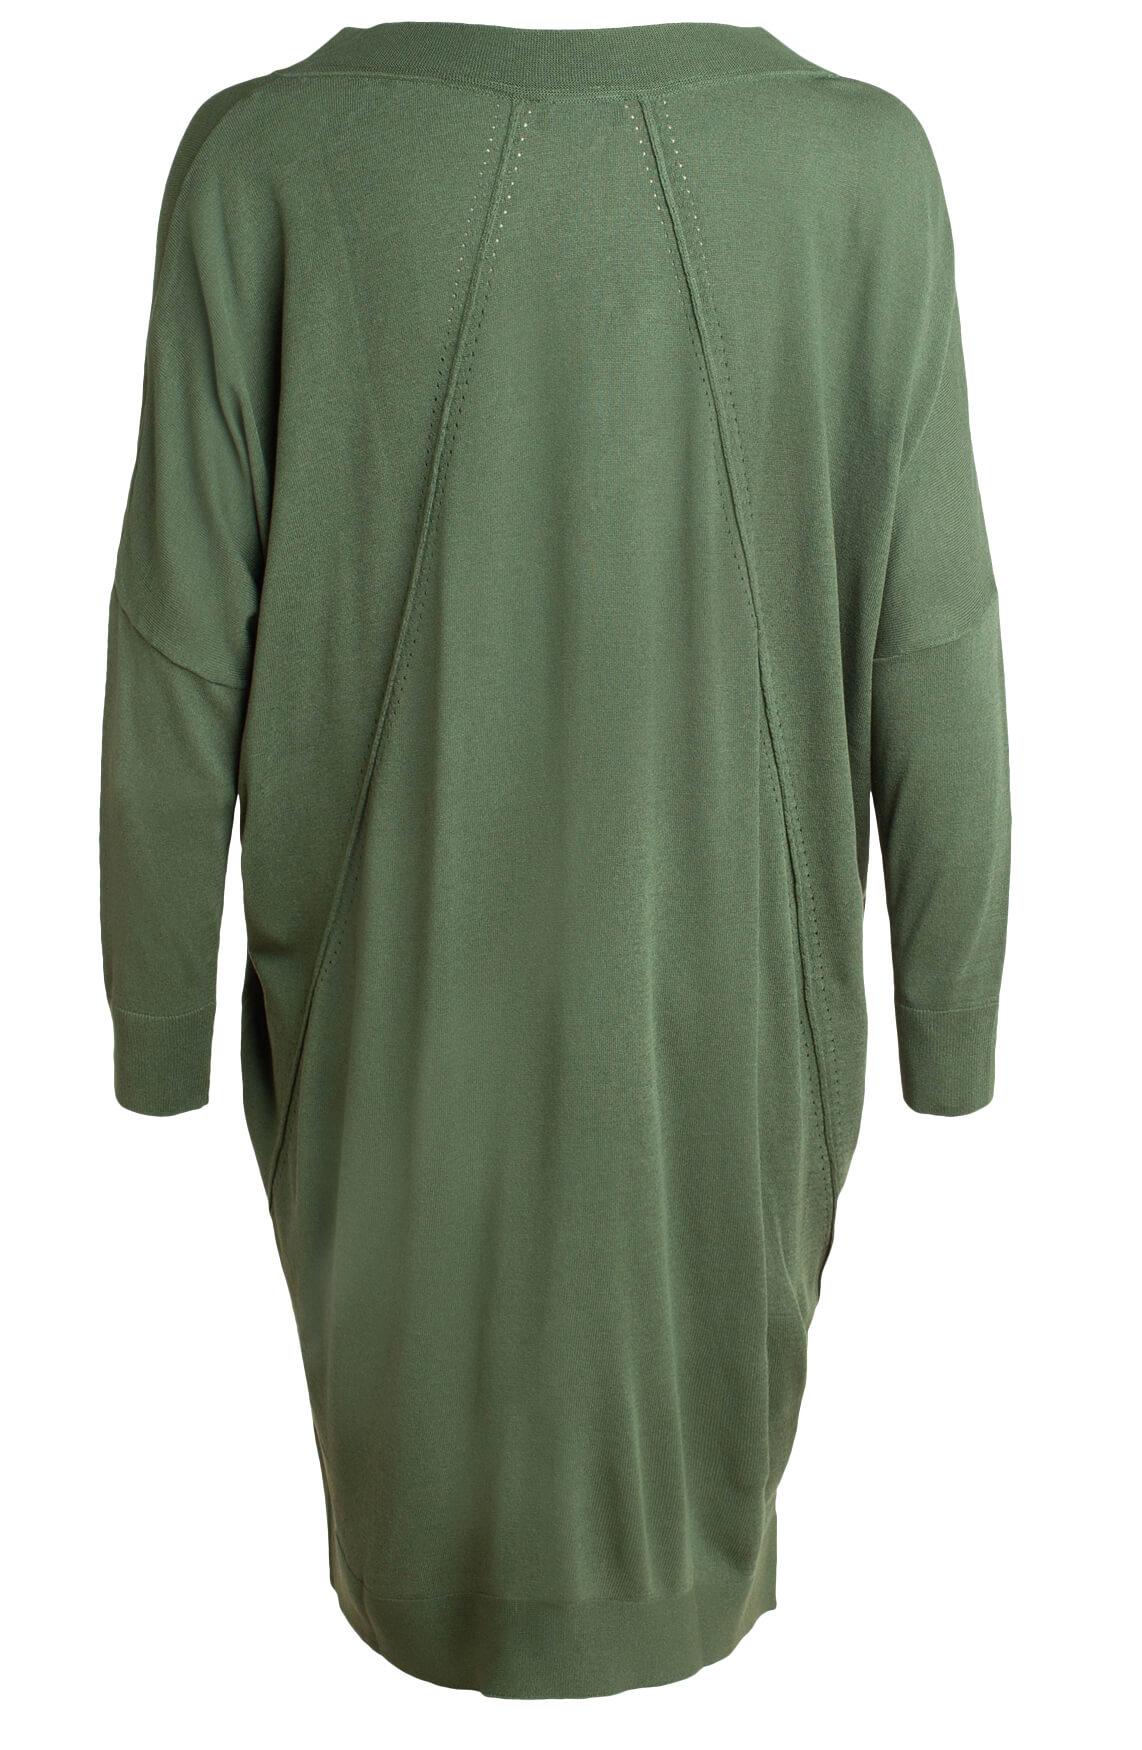 Alix The Label Dames Oversized jurk groen